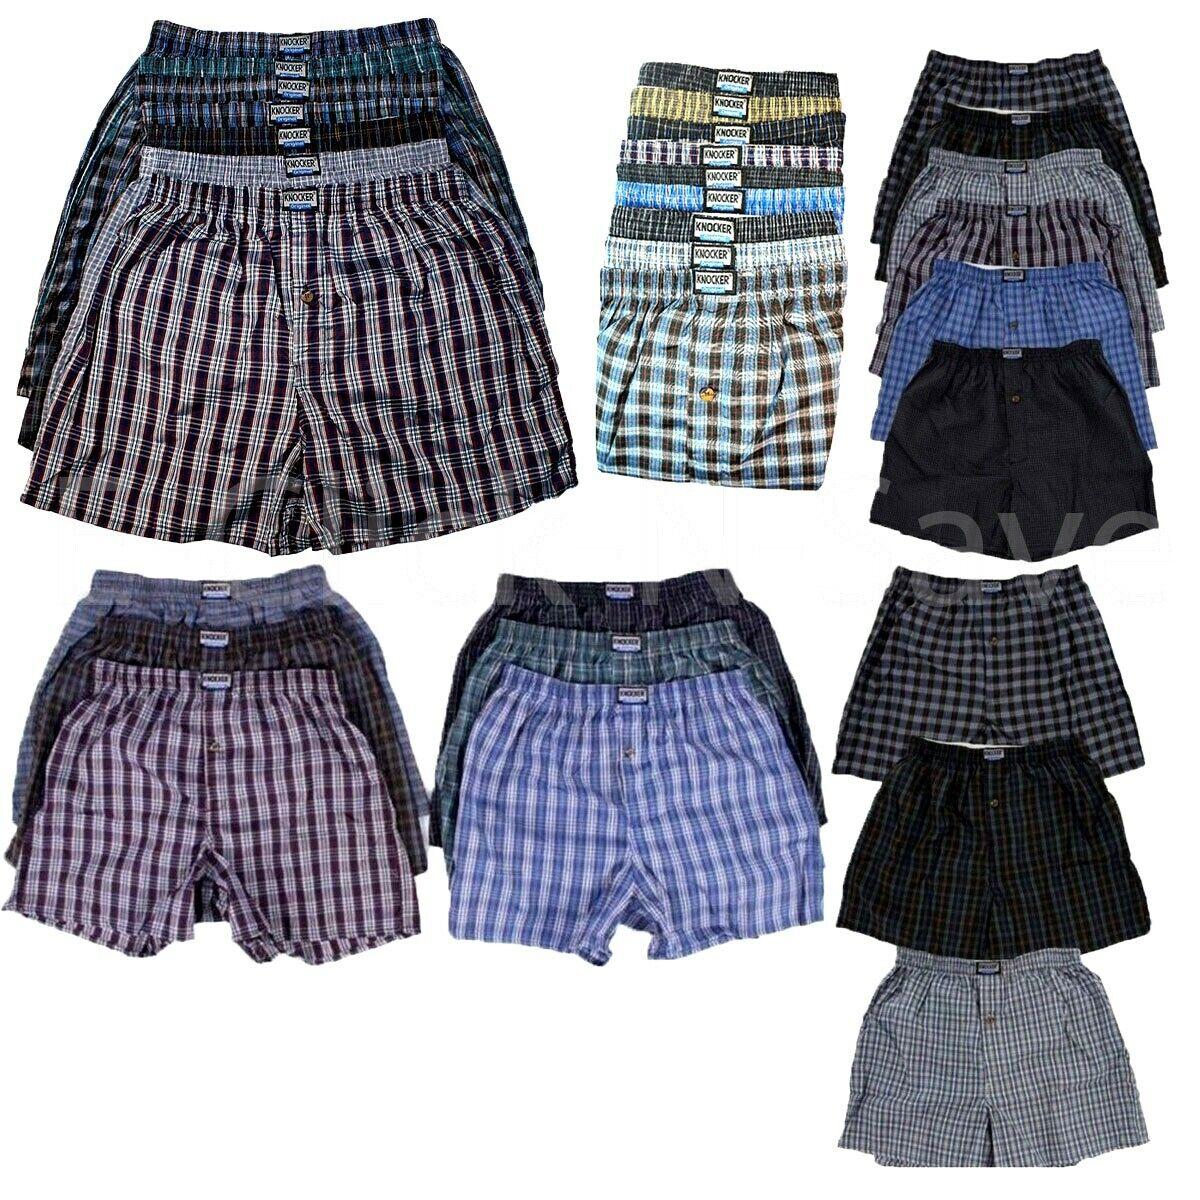 3 6 12 PACK Men Knocker Plaid Boxer Shorts Underwear Lot Tru